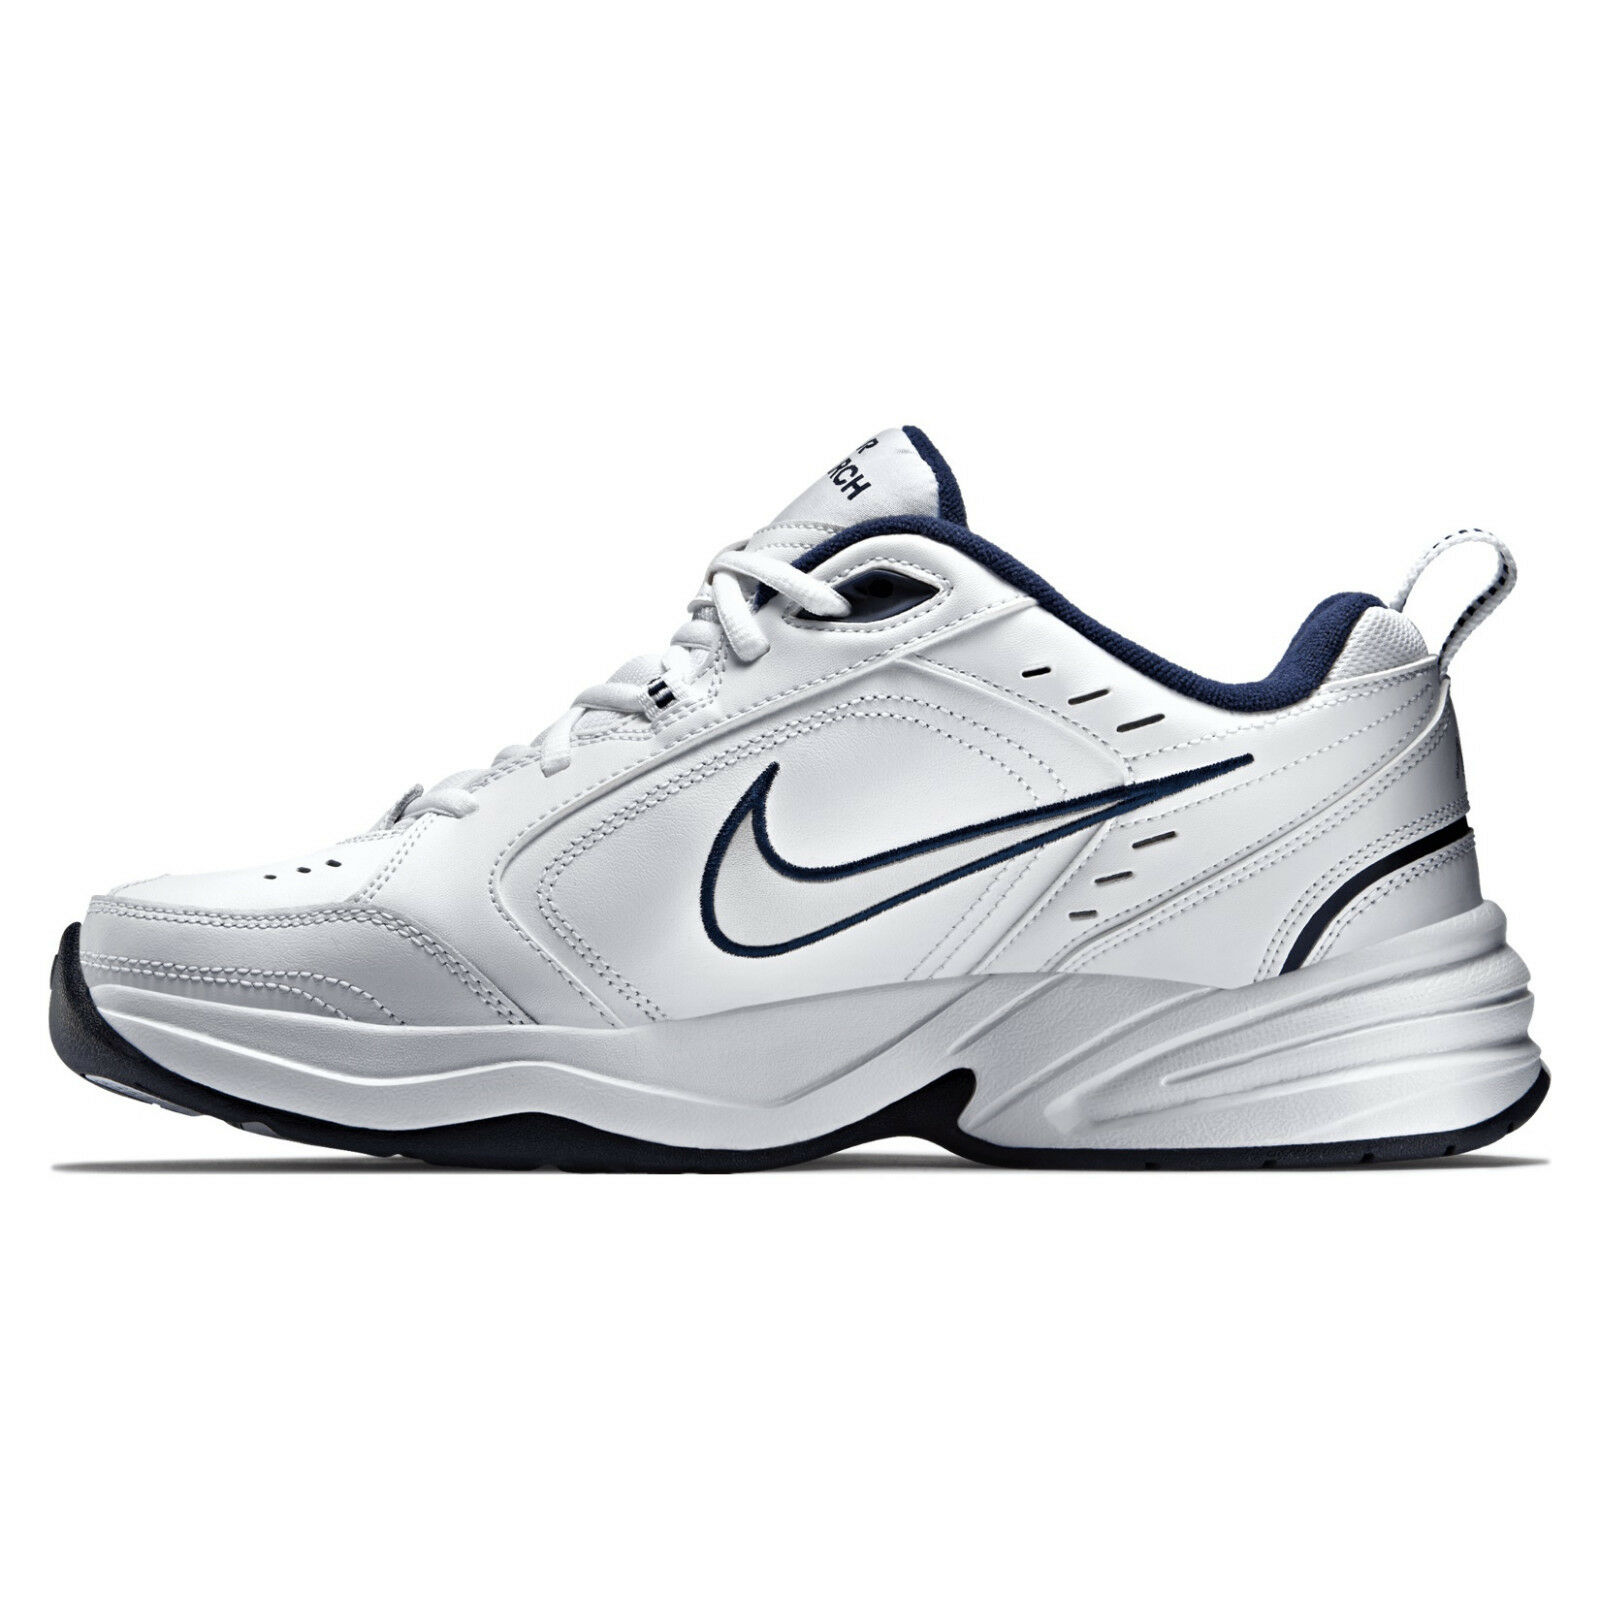 Nike Air Monarch IV Weiß Herren Lifestyle Sneaker Neu retro